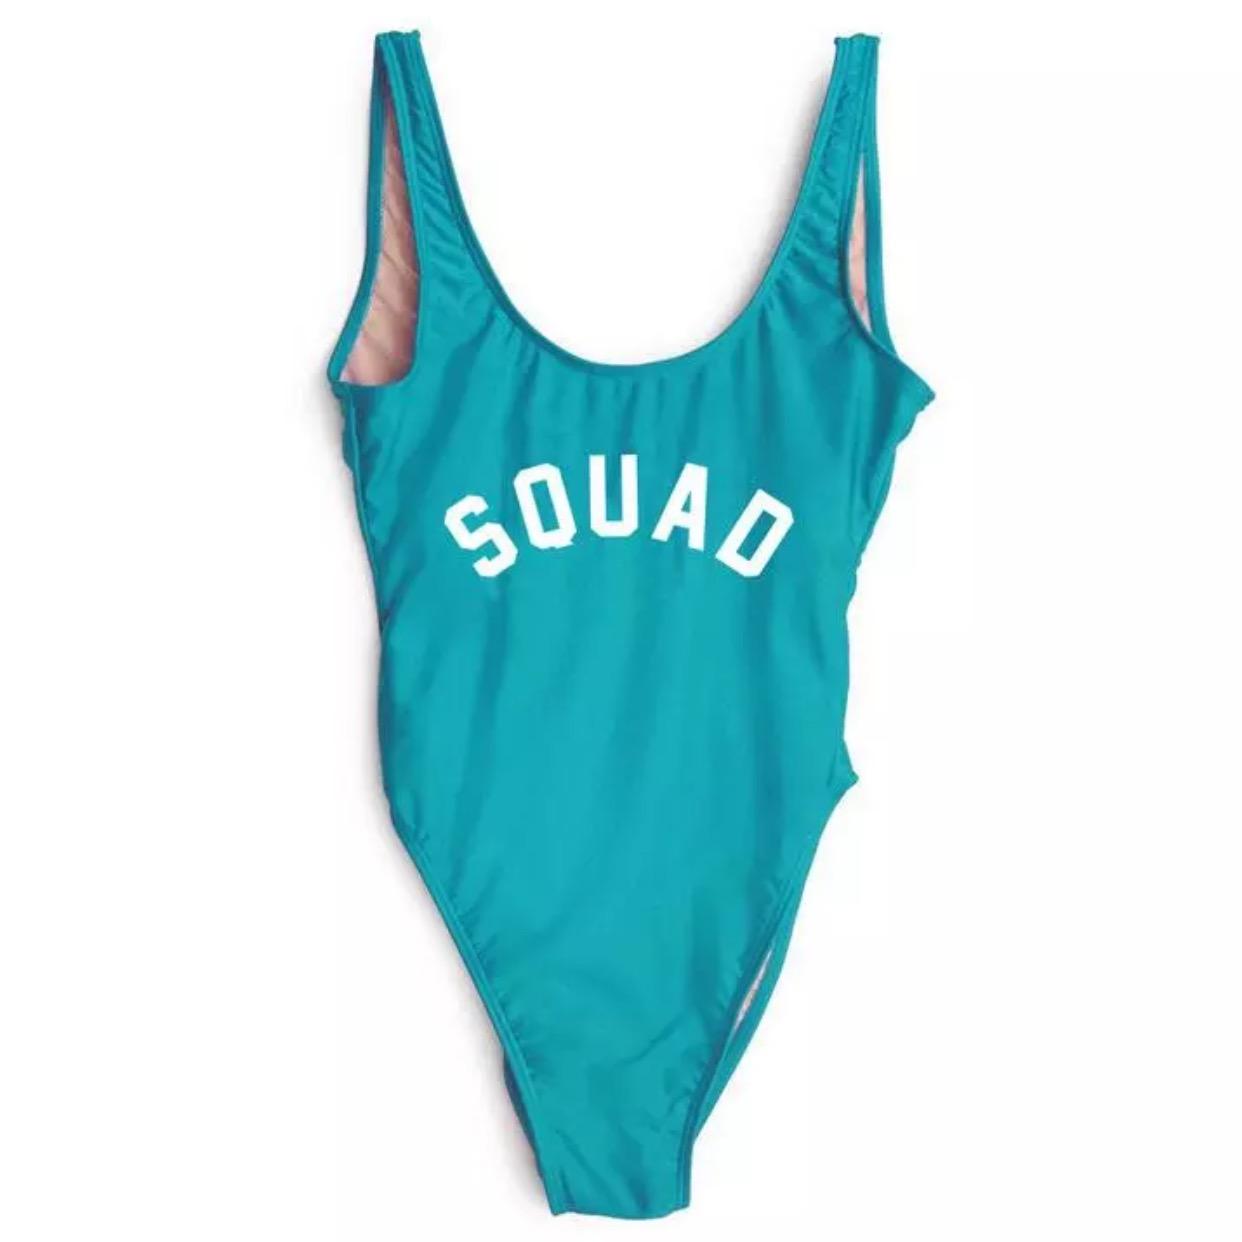 4594f85677 SQUAD One Piece Swimsuit Bathing Suit Monokini Bodysuit Bikini - Thumbnail 1  ...